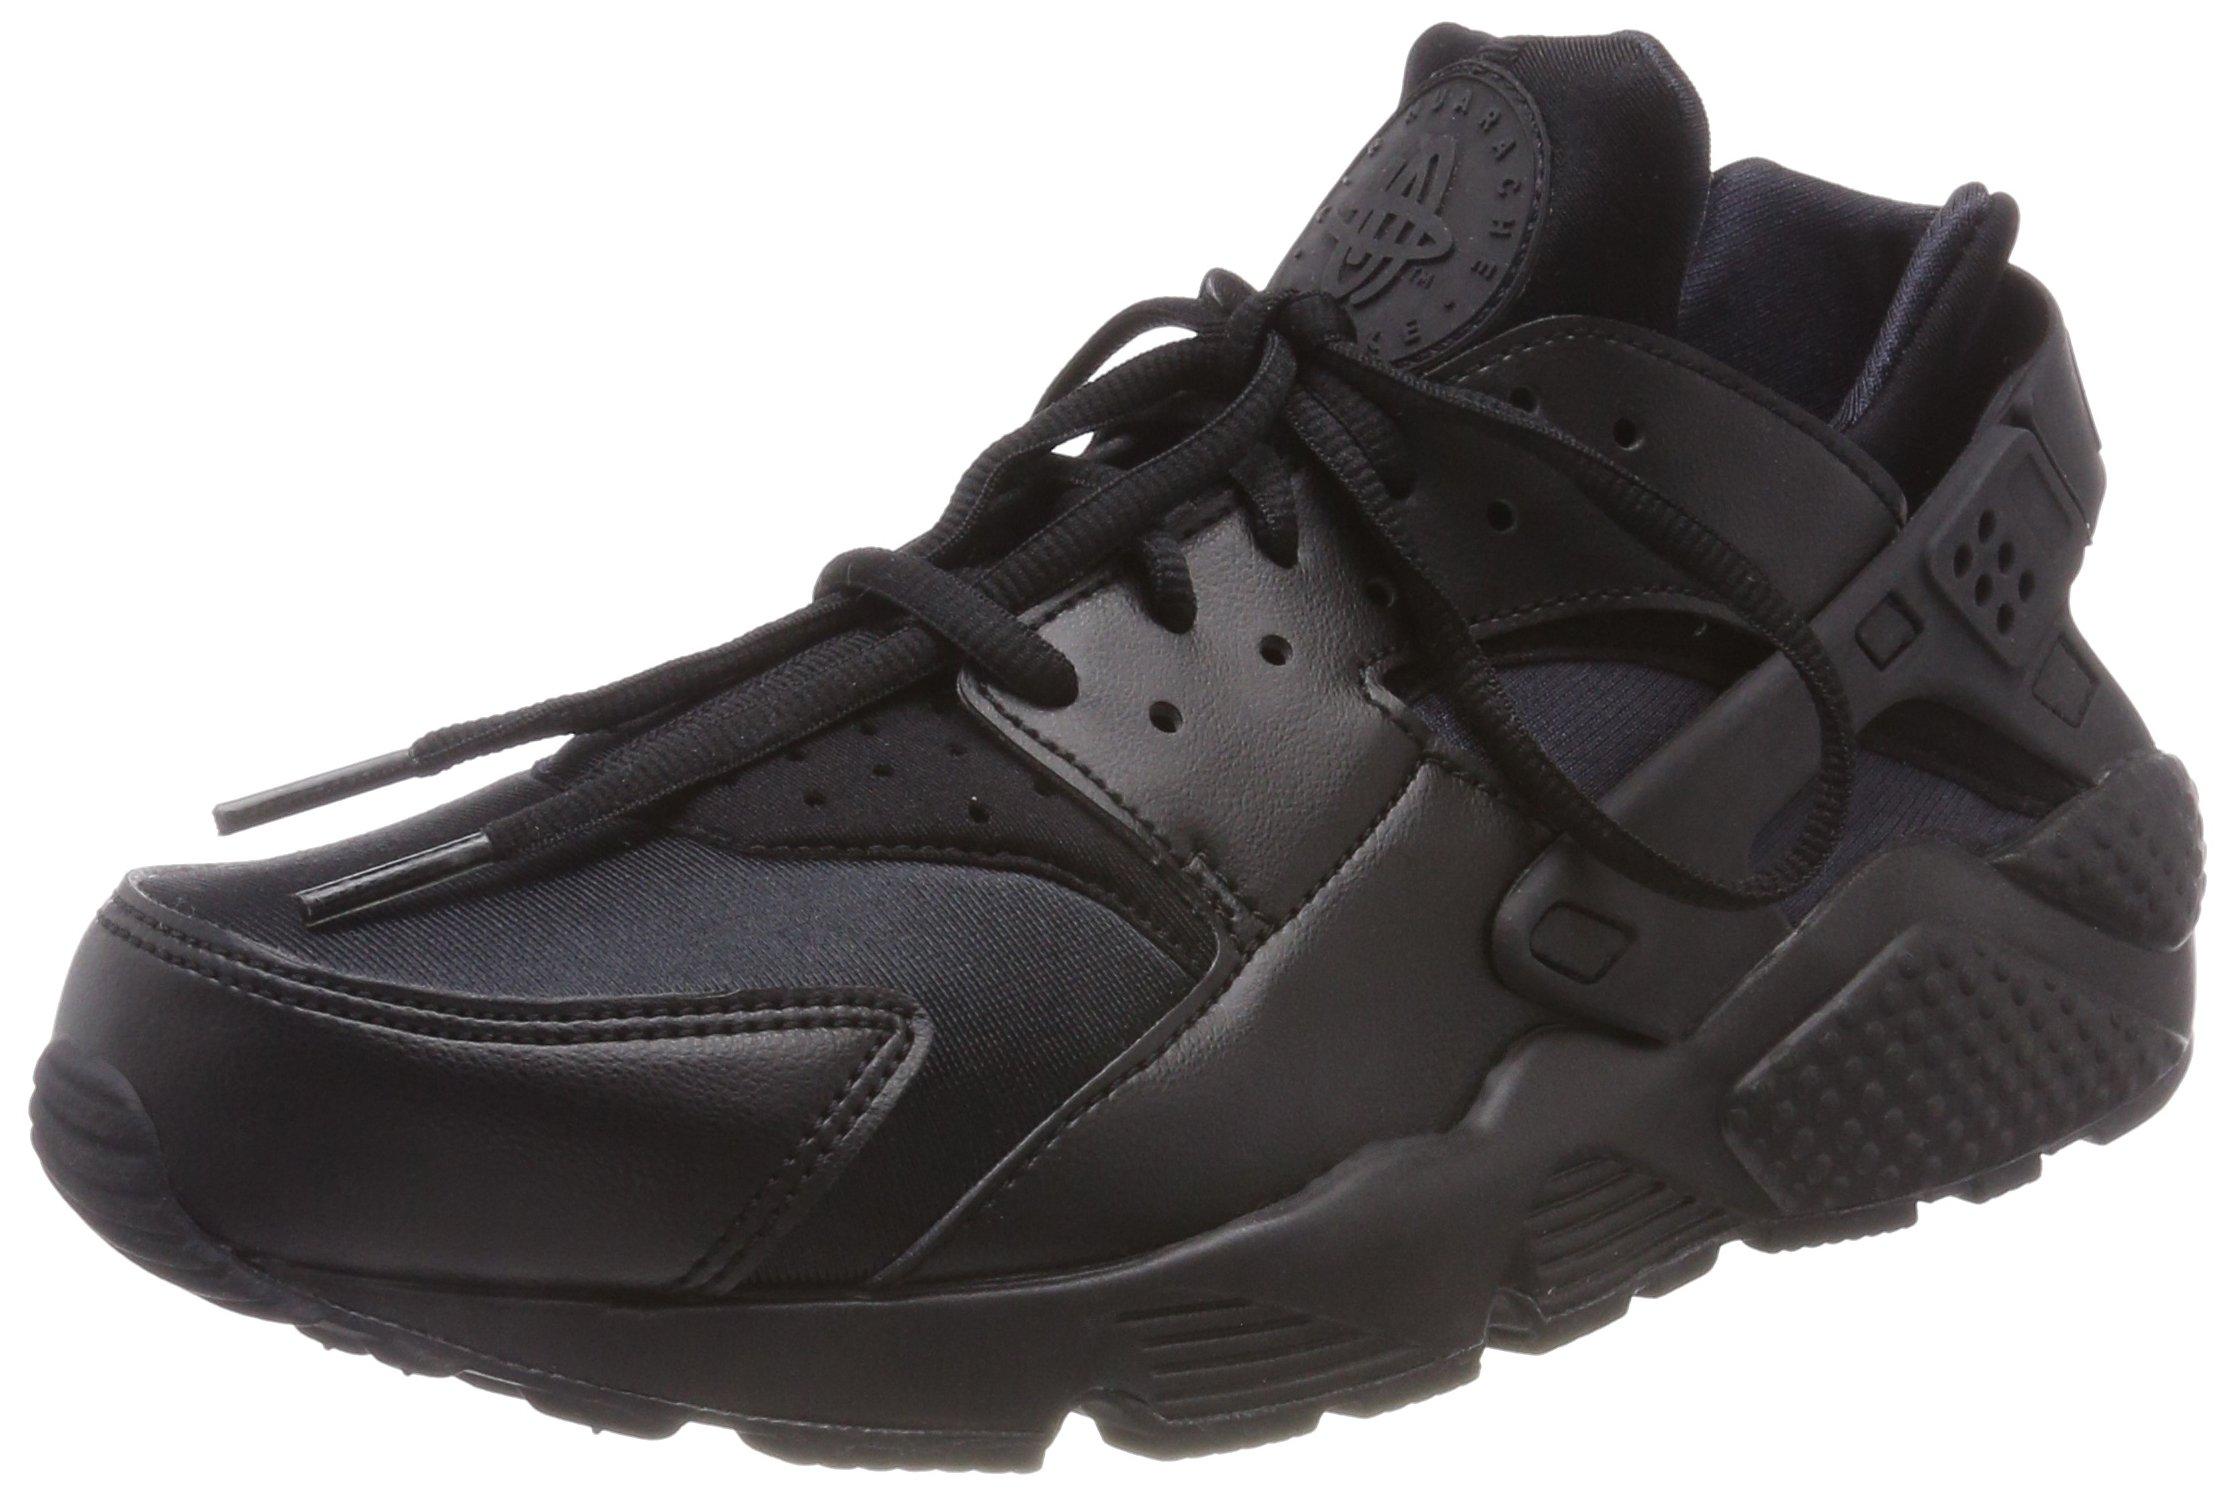 f13f9191683 Galleon - Nike Women s Air Huarache Run Running Shoe 6 Black